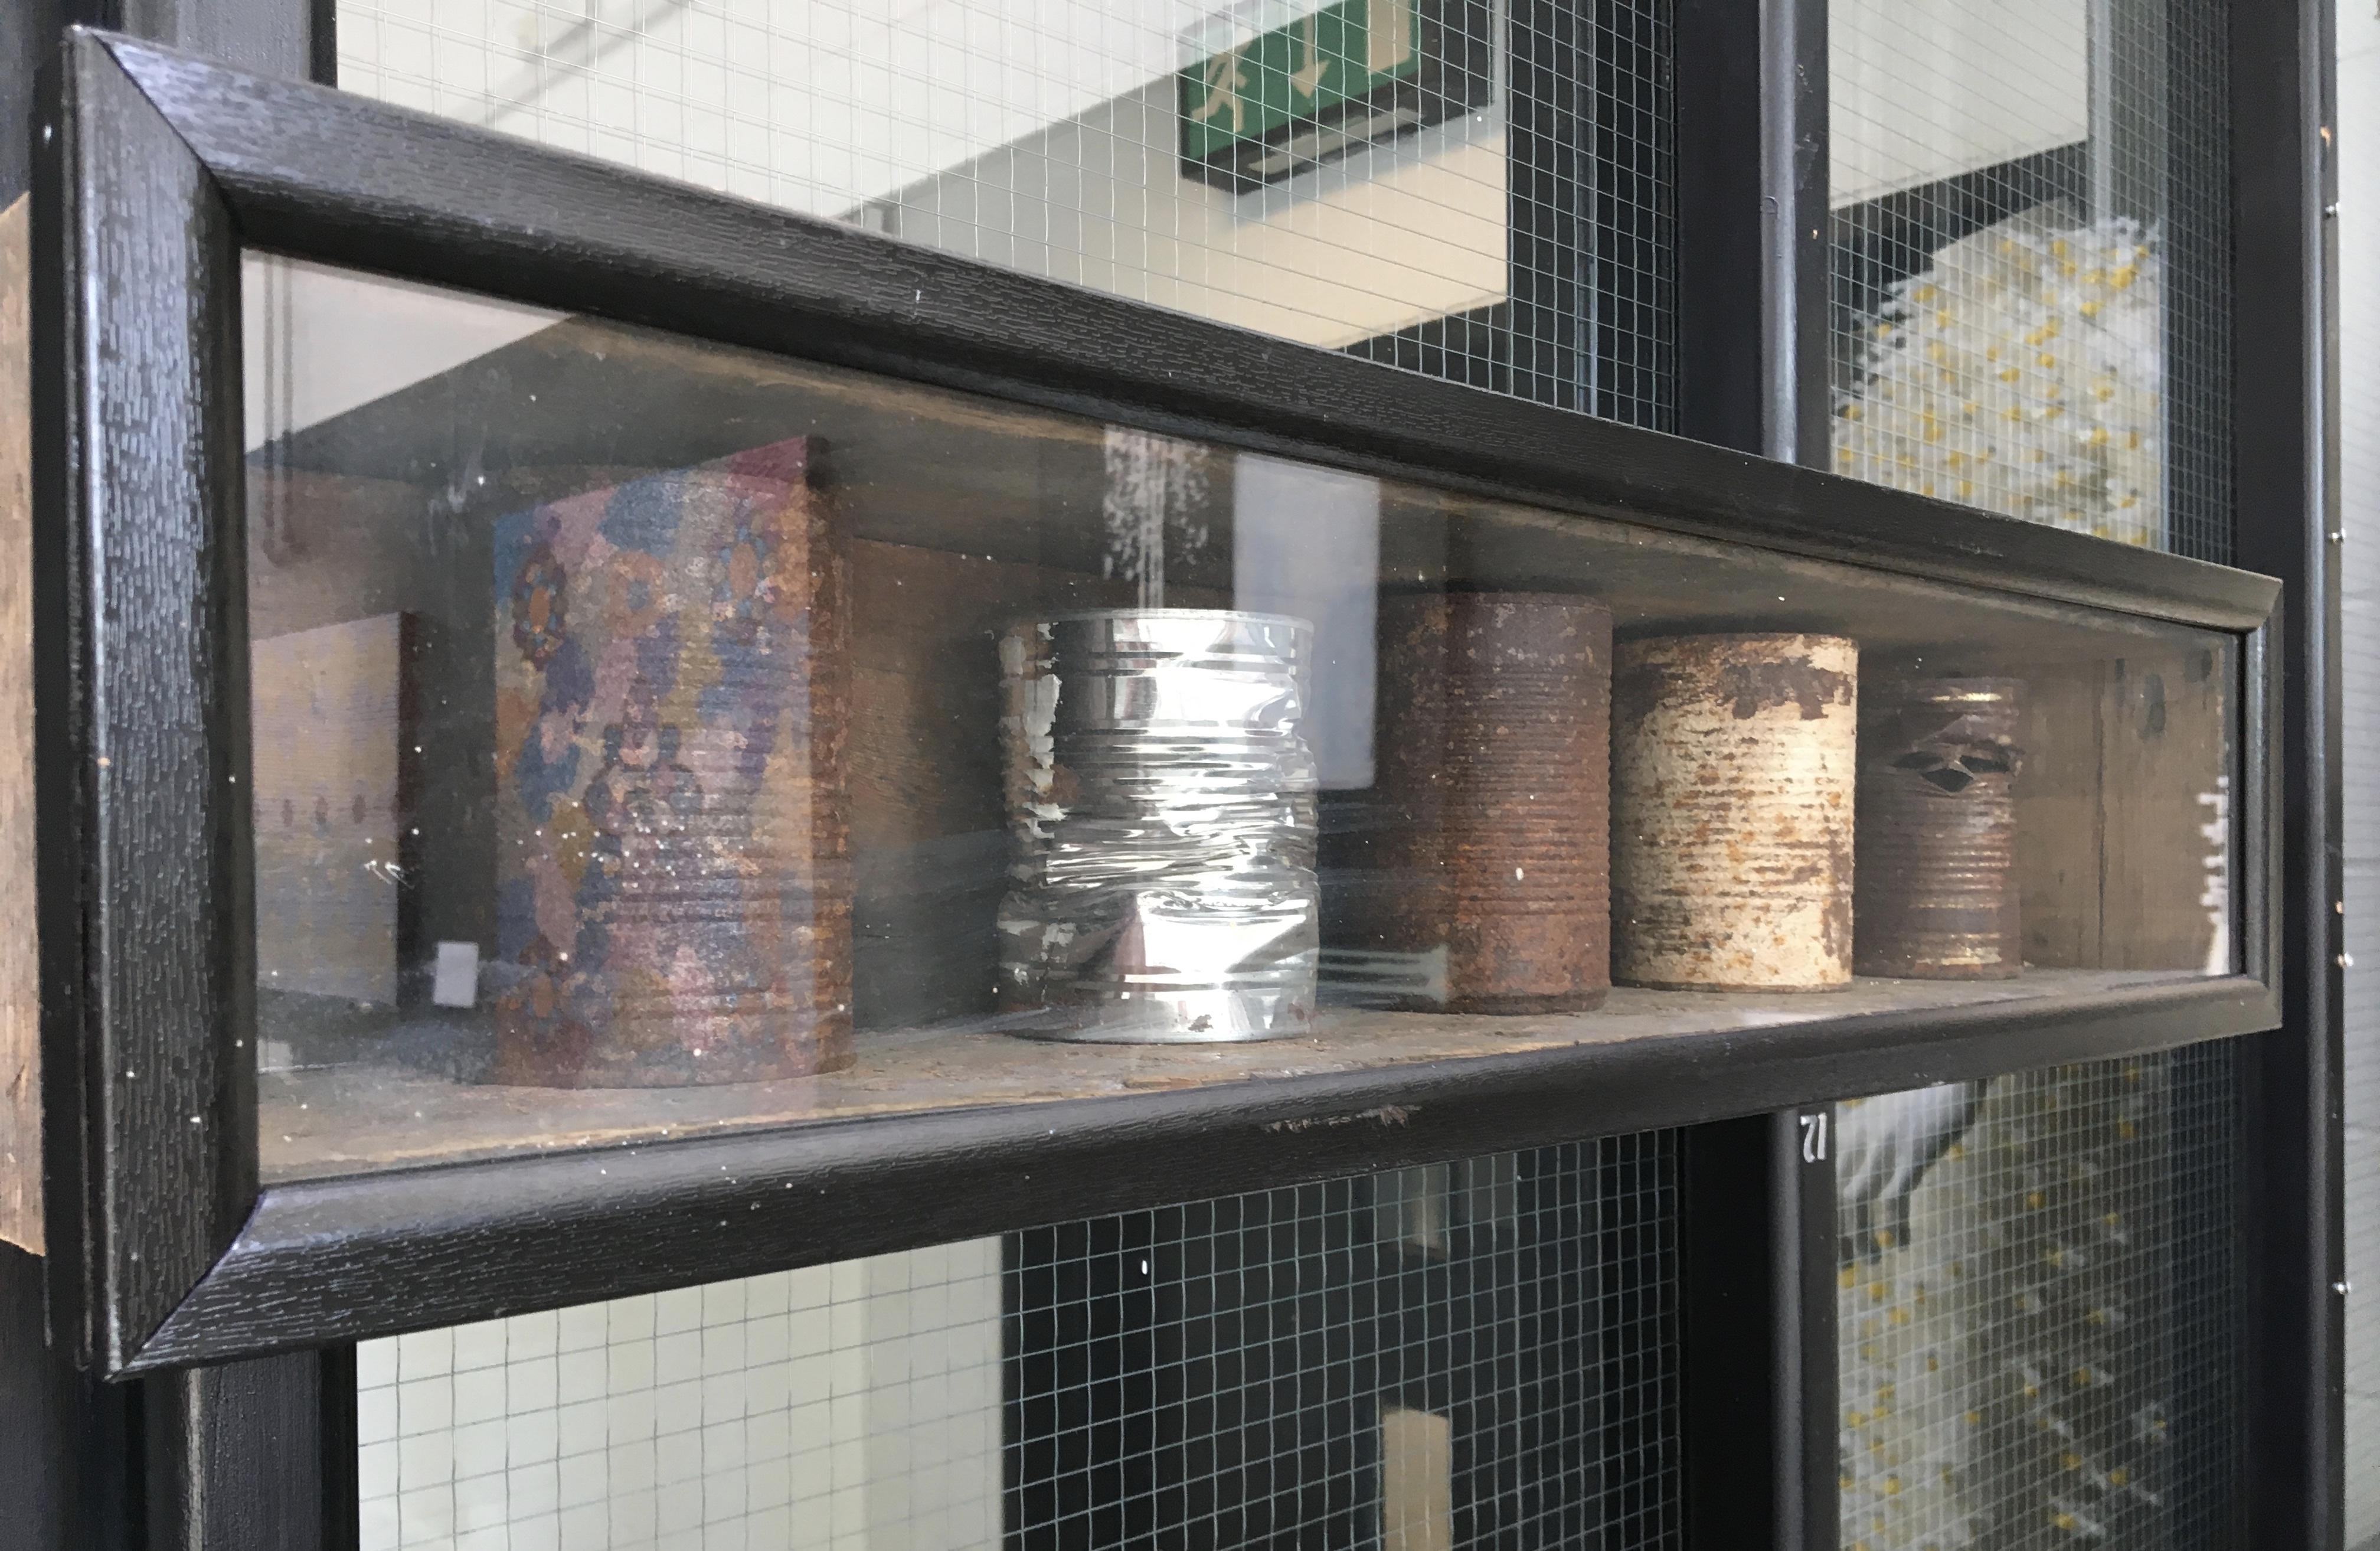 71. Tin Can Theory, Alexander Osbourne, 73 x 17 x 15, £150.